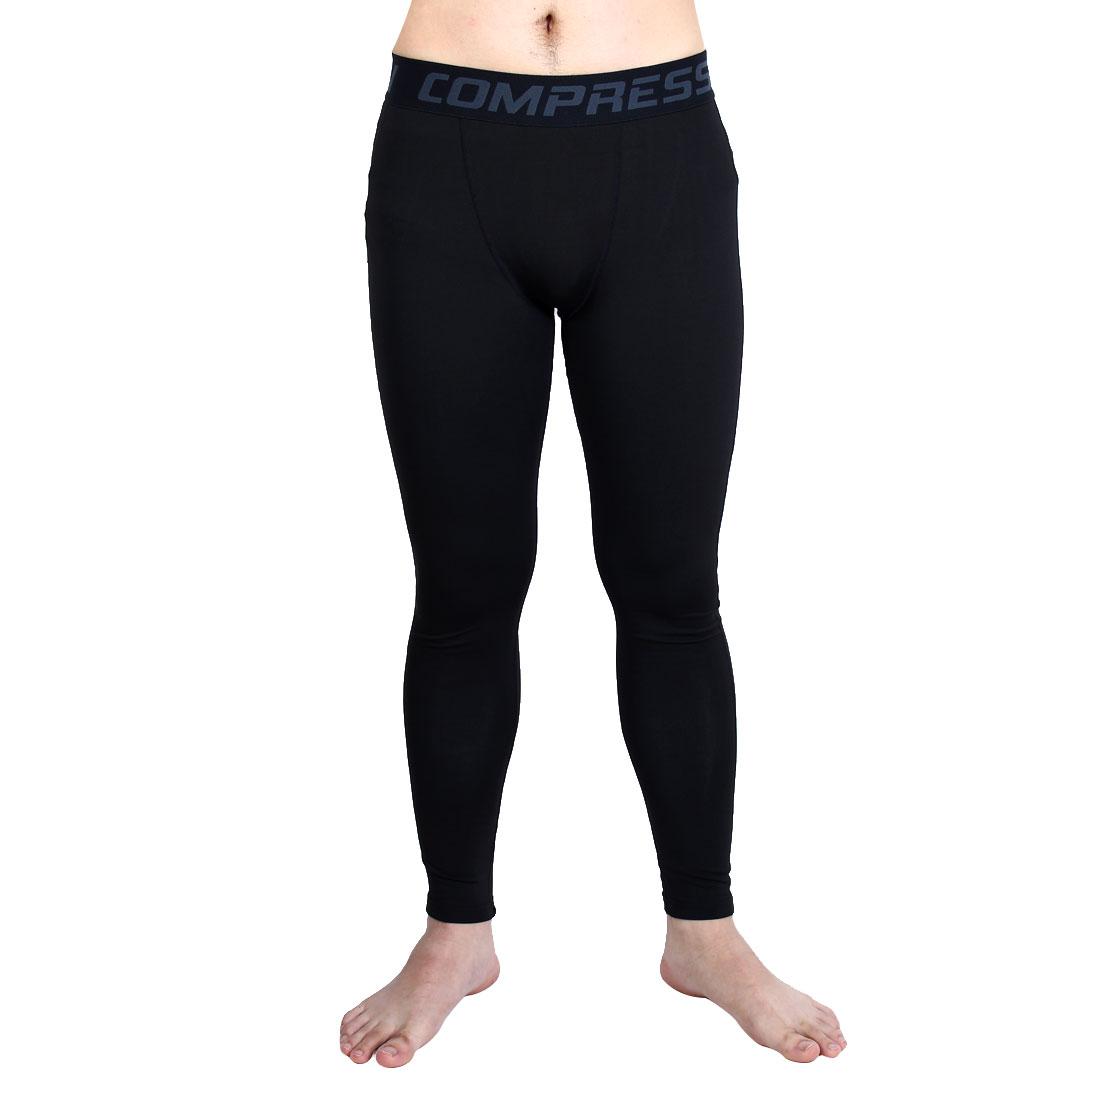 Men Running Biking Athletic Trousers Activewear Outdoor Sports Pants Black W30